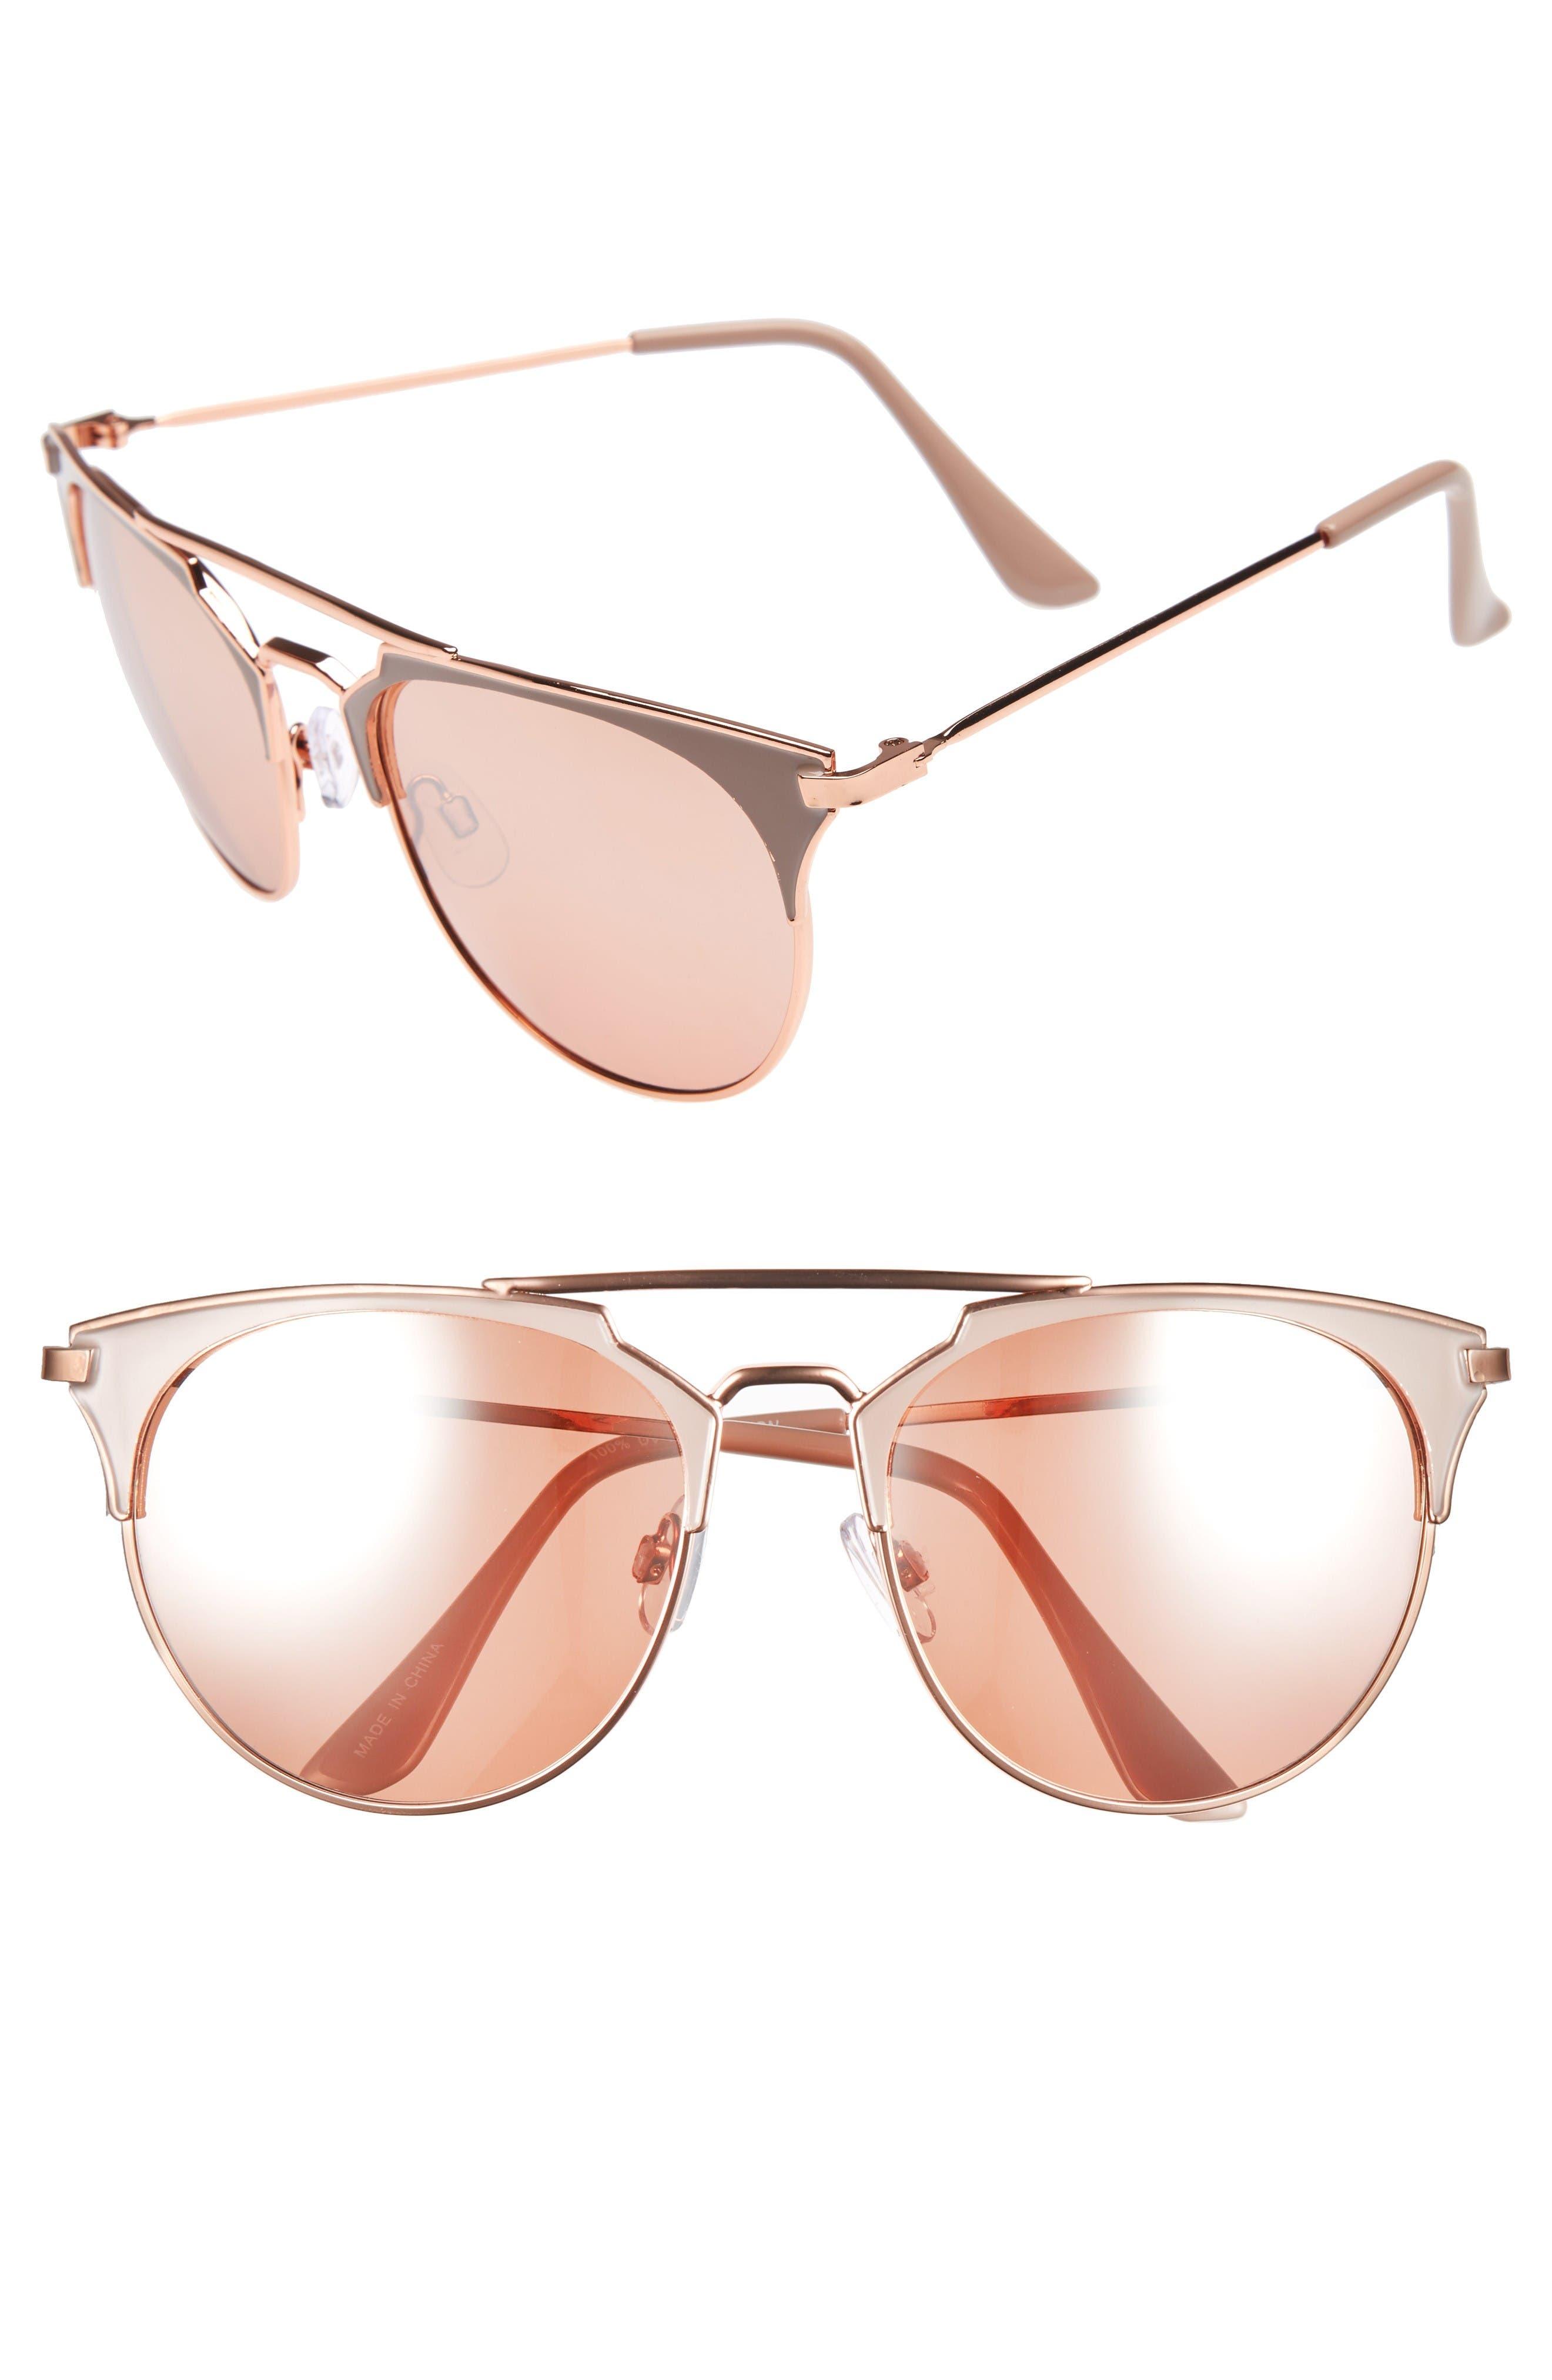 Alternate Image 1 Selected - BP. Retro Sunglasses